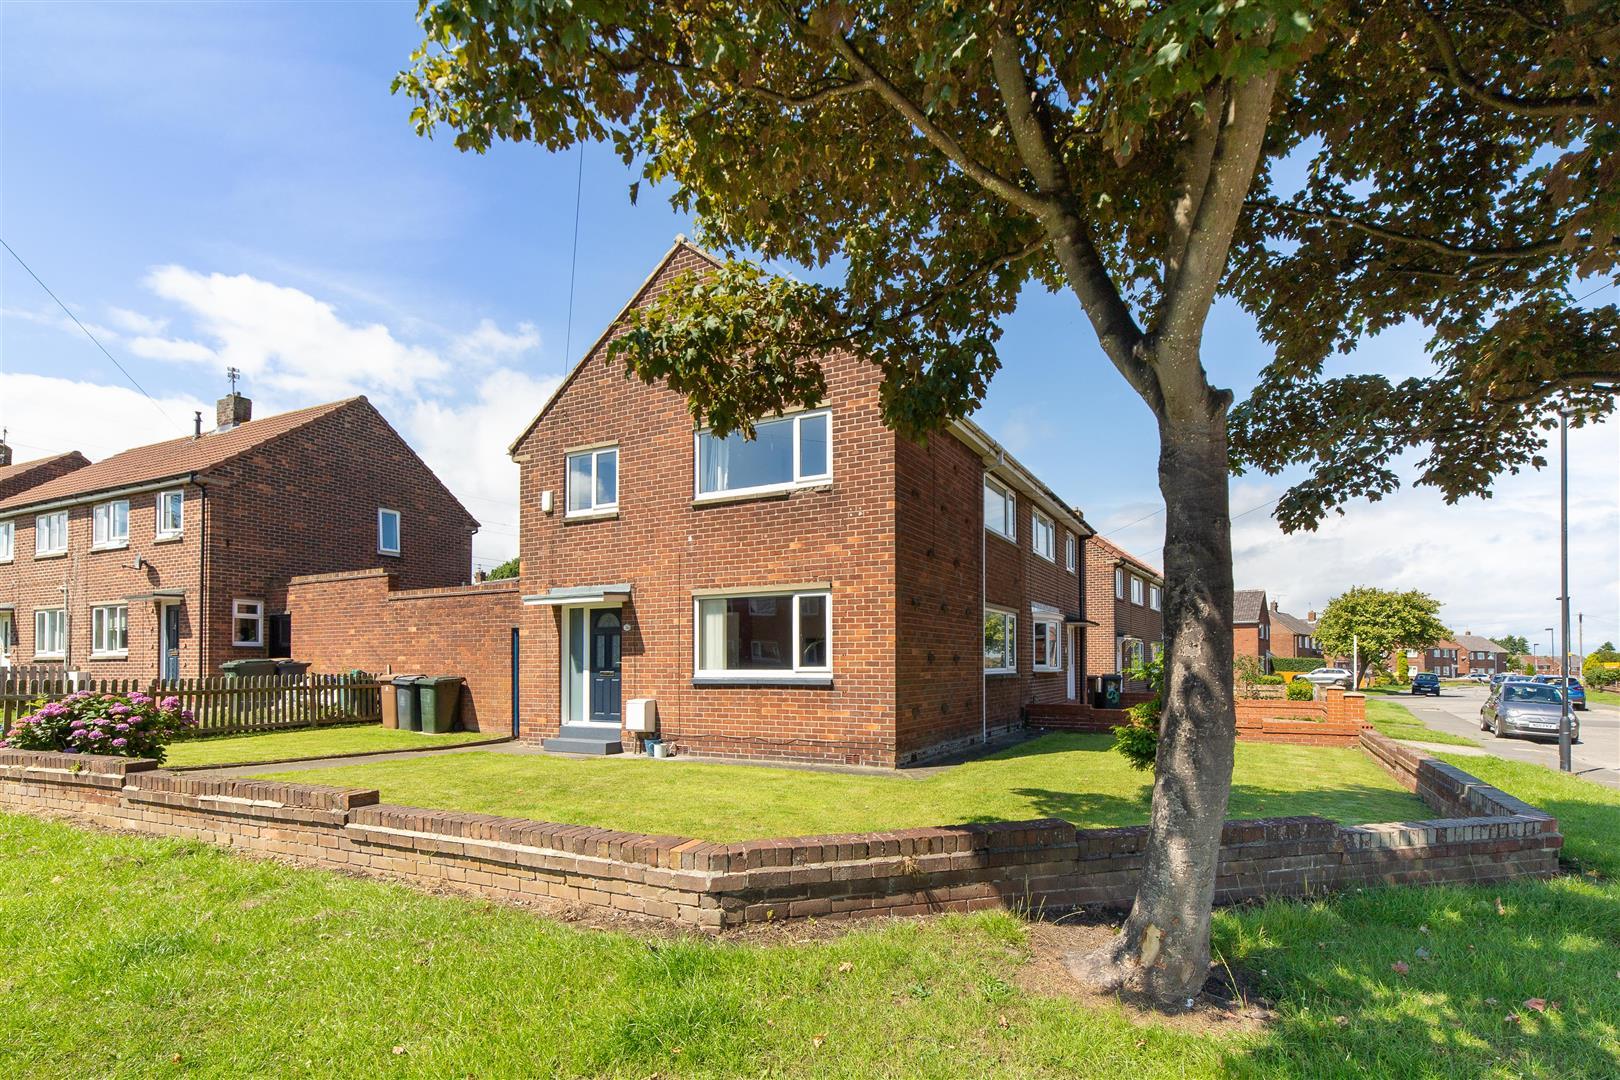 3 bed semi-detached house for sale in Newcastle Upon Tyne, NE27 0QA, NE27